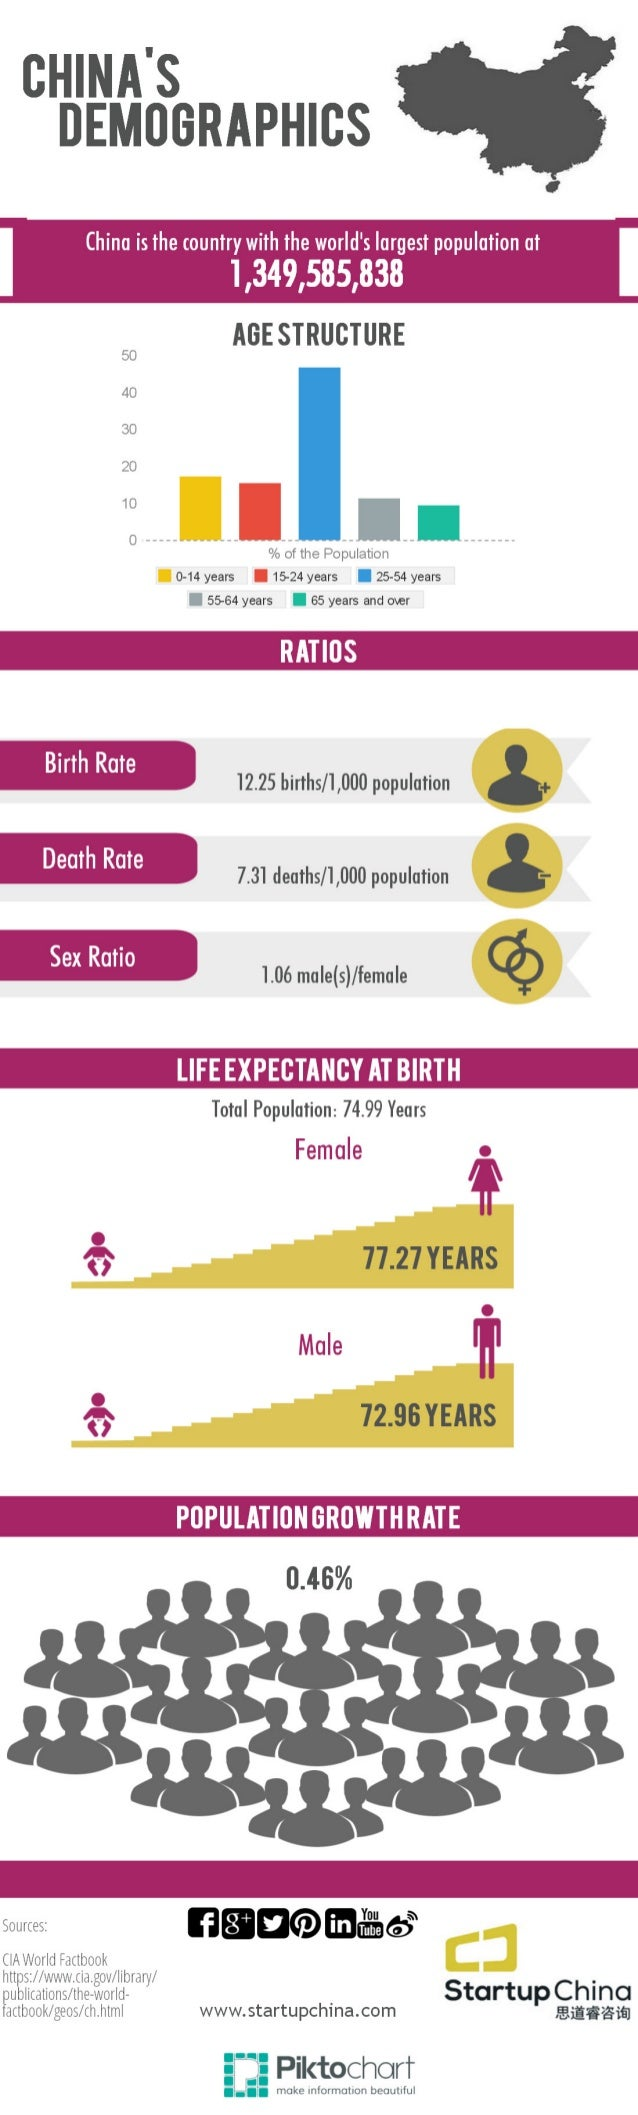 China's Demographics